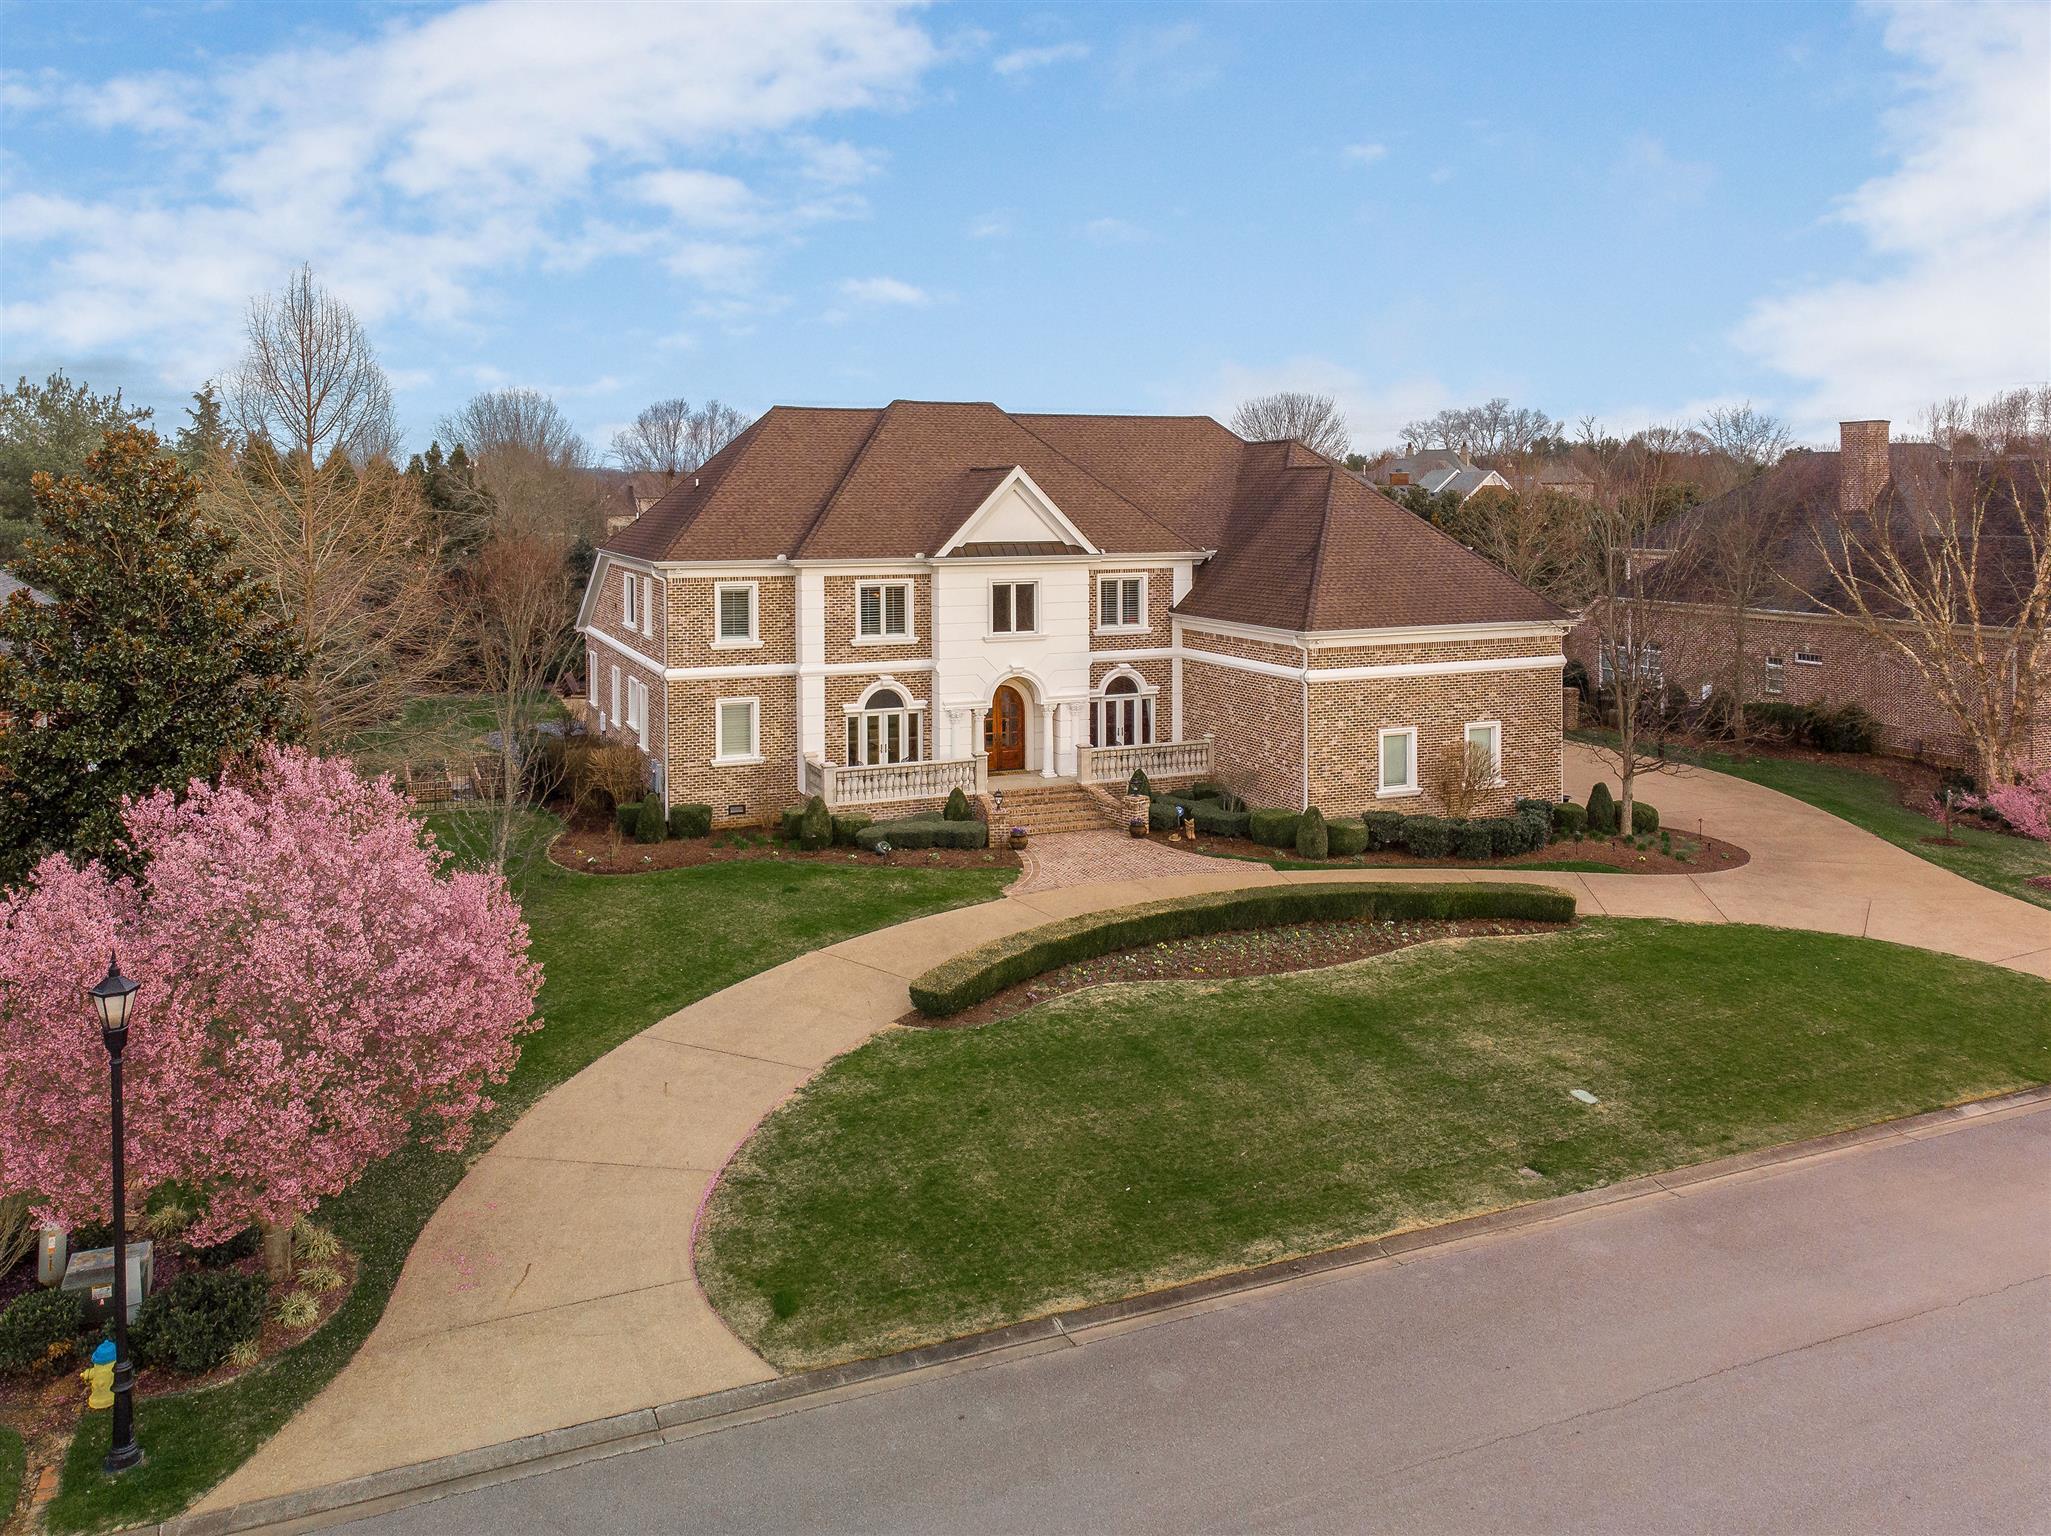 1466 Avellino Cir, Murfreesboro, TN 37130 - Murfreesboro, TN real estate listing